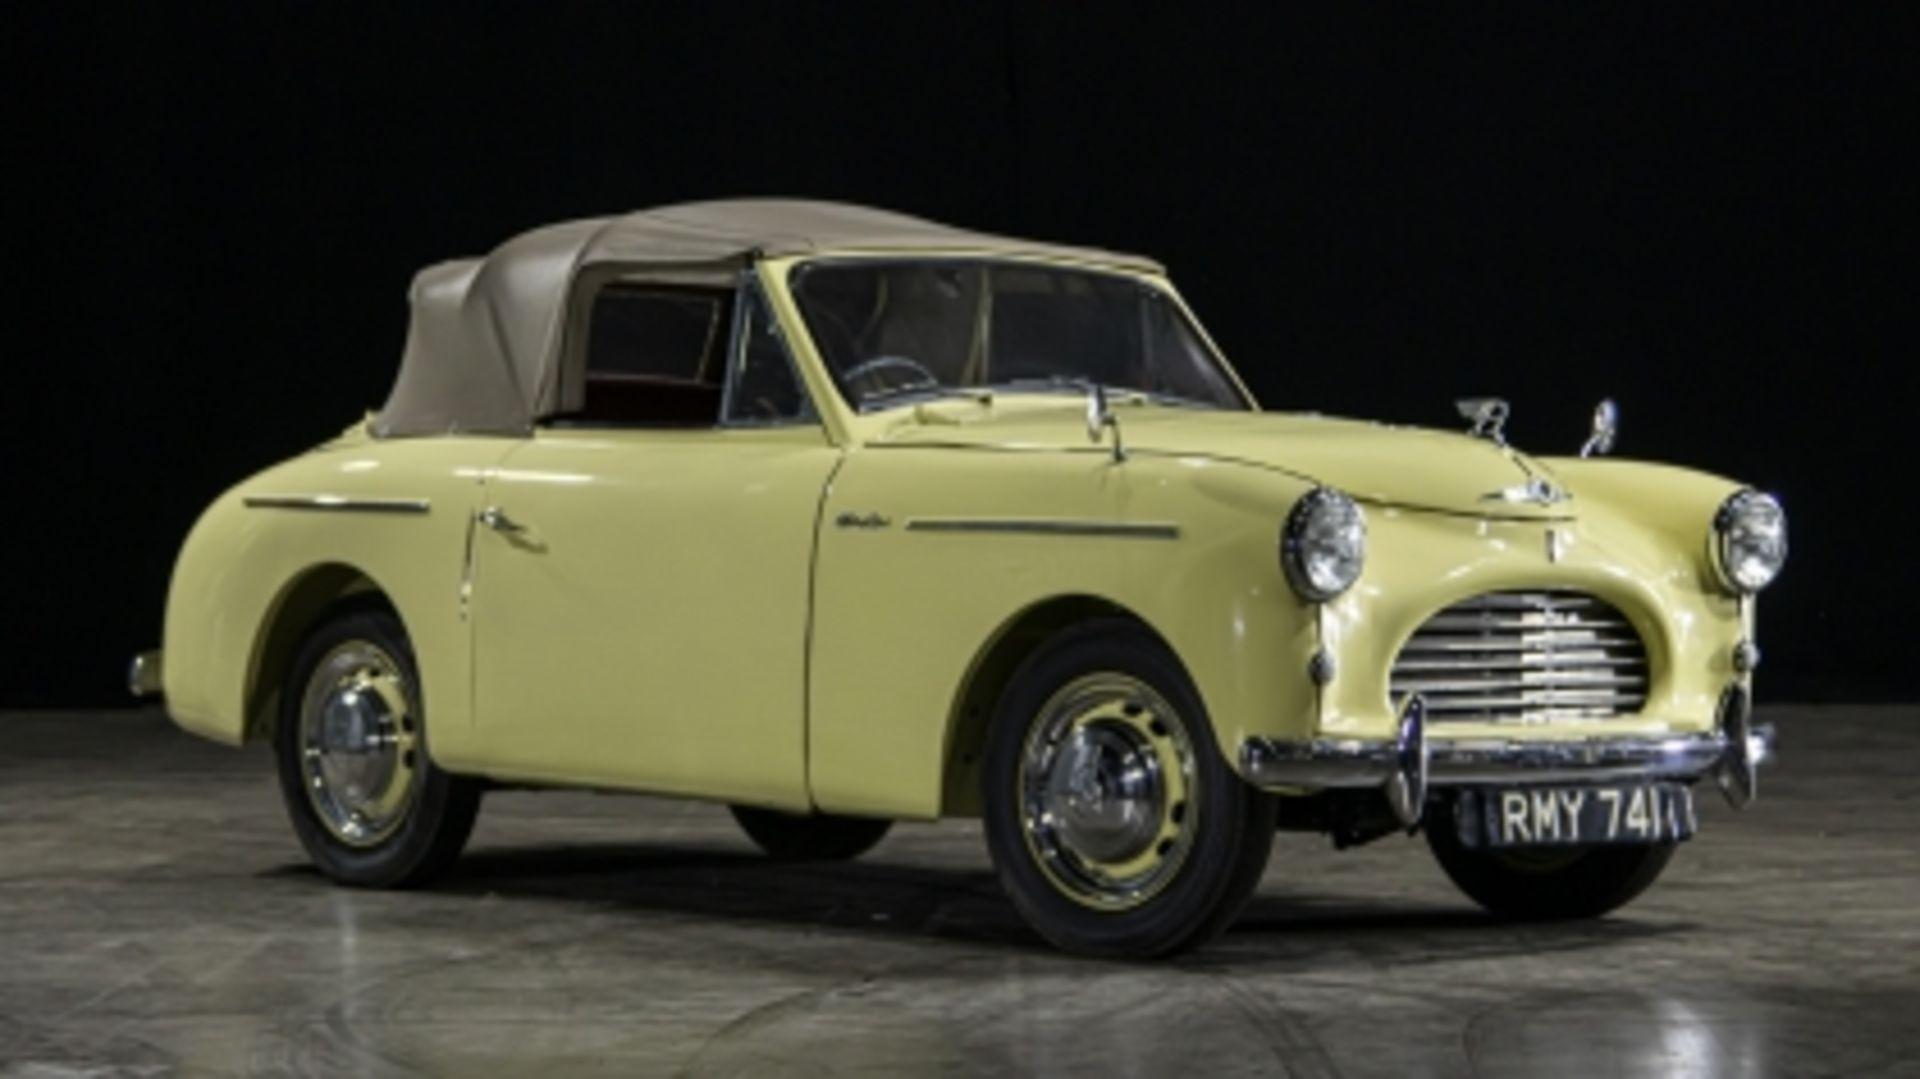 Lot 533 - 1952 Austin A40 Sports